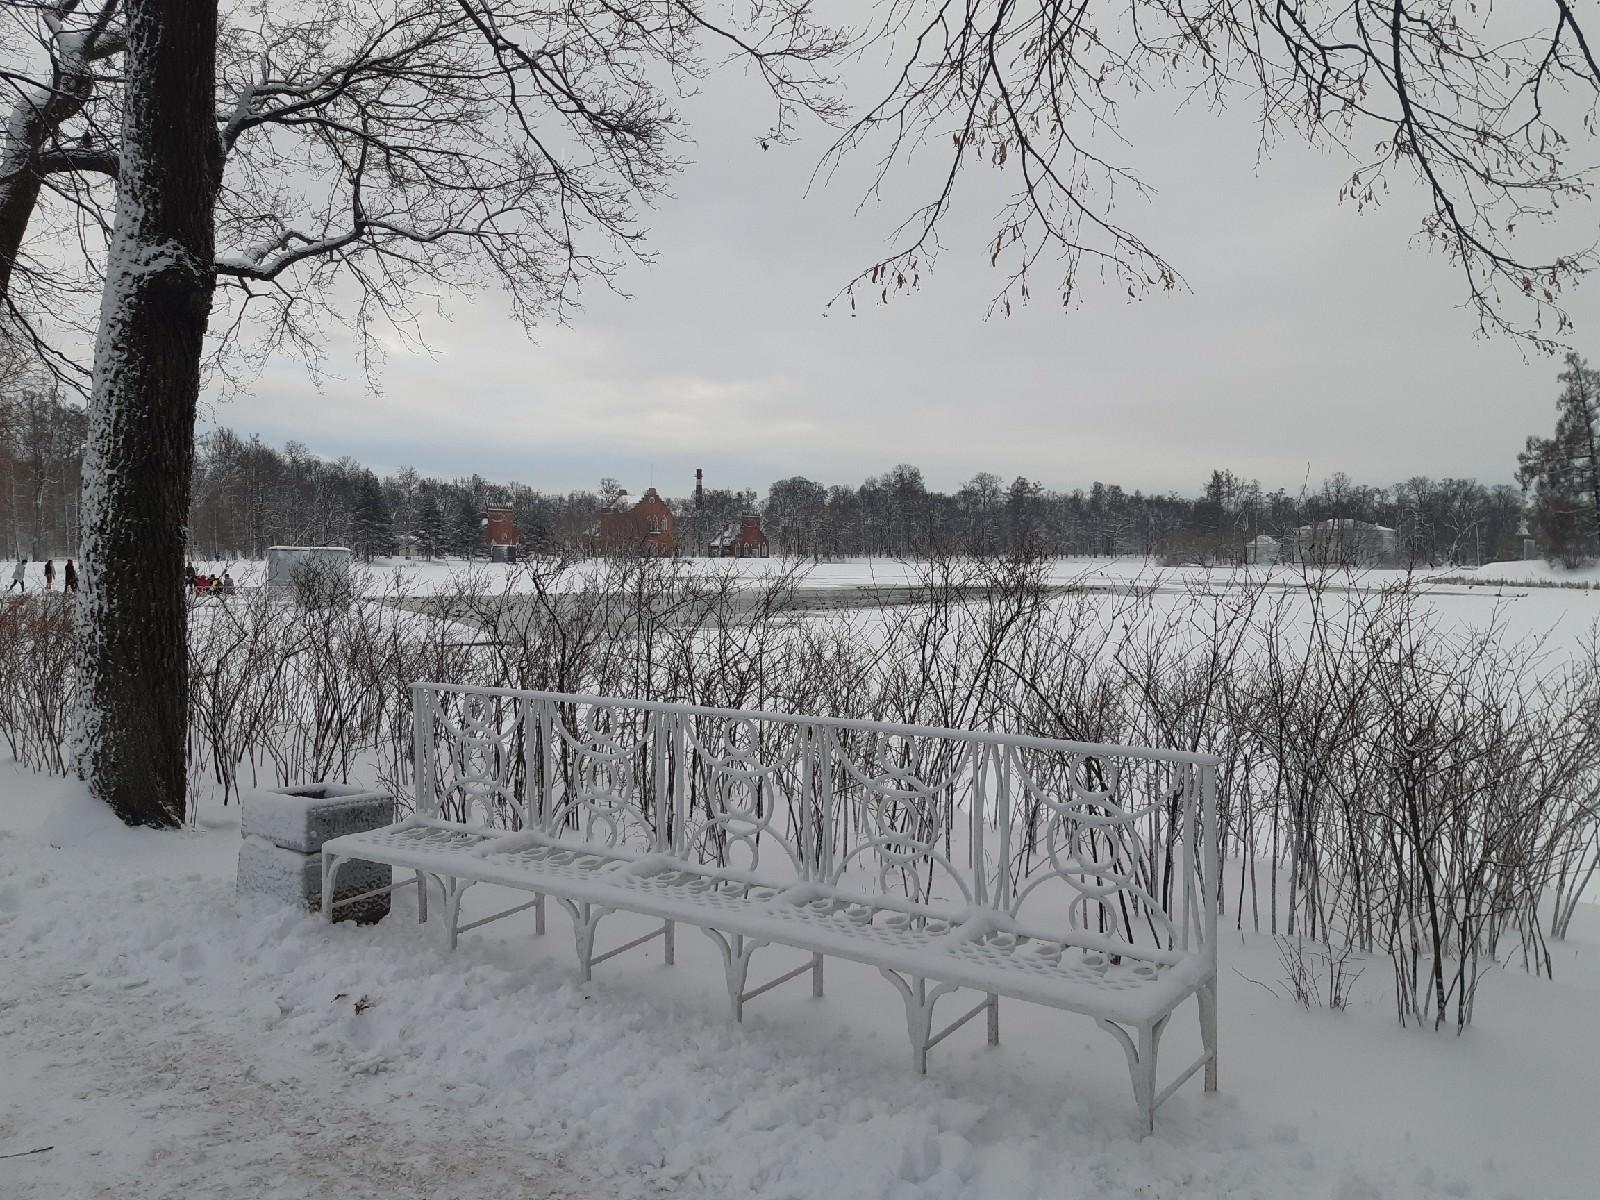 Le parc du palais de Catherine Tsarskoye selo ут ршмук